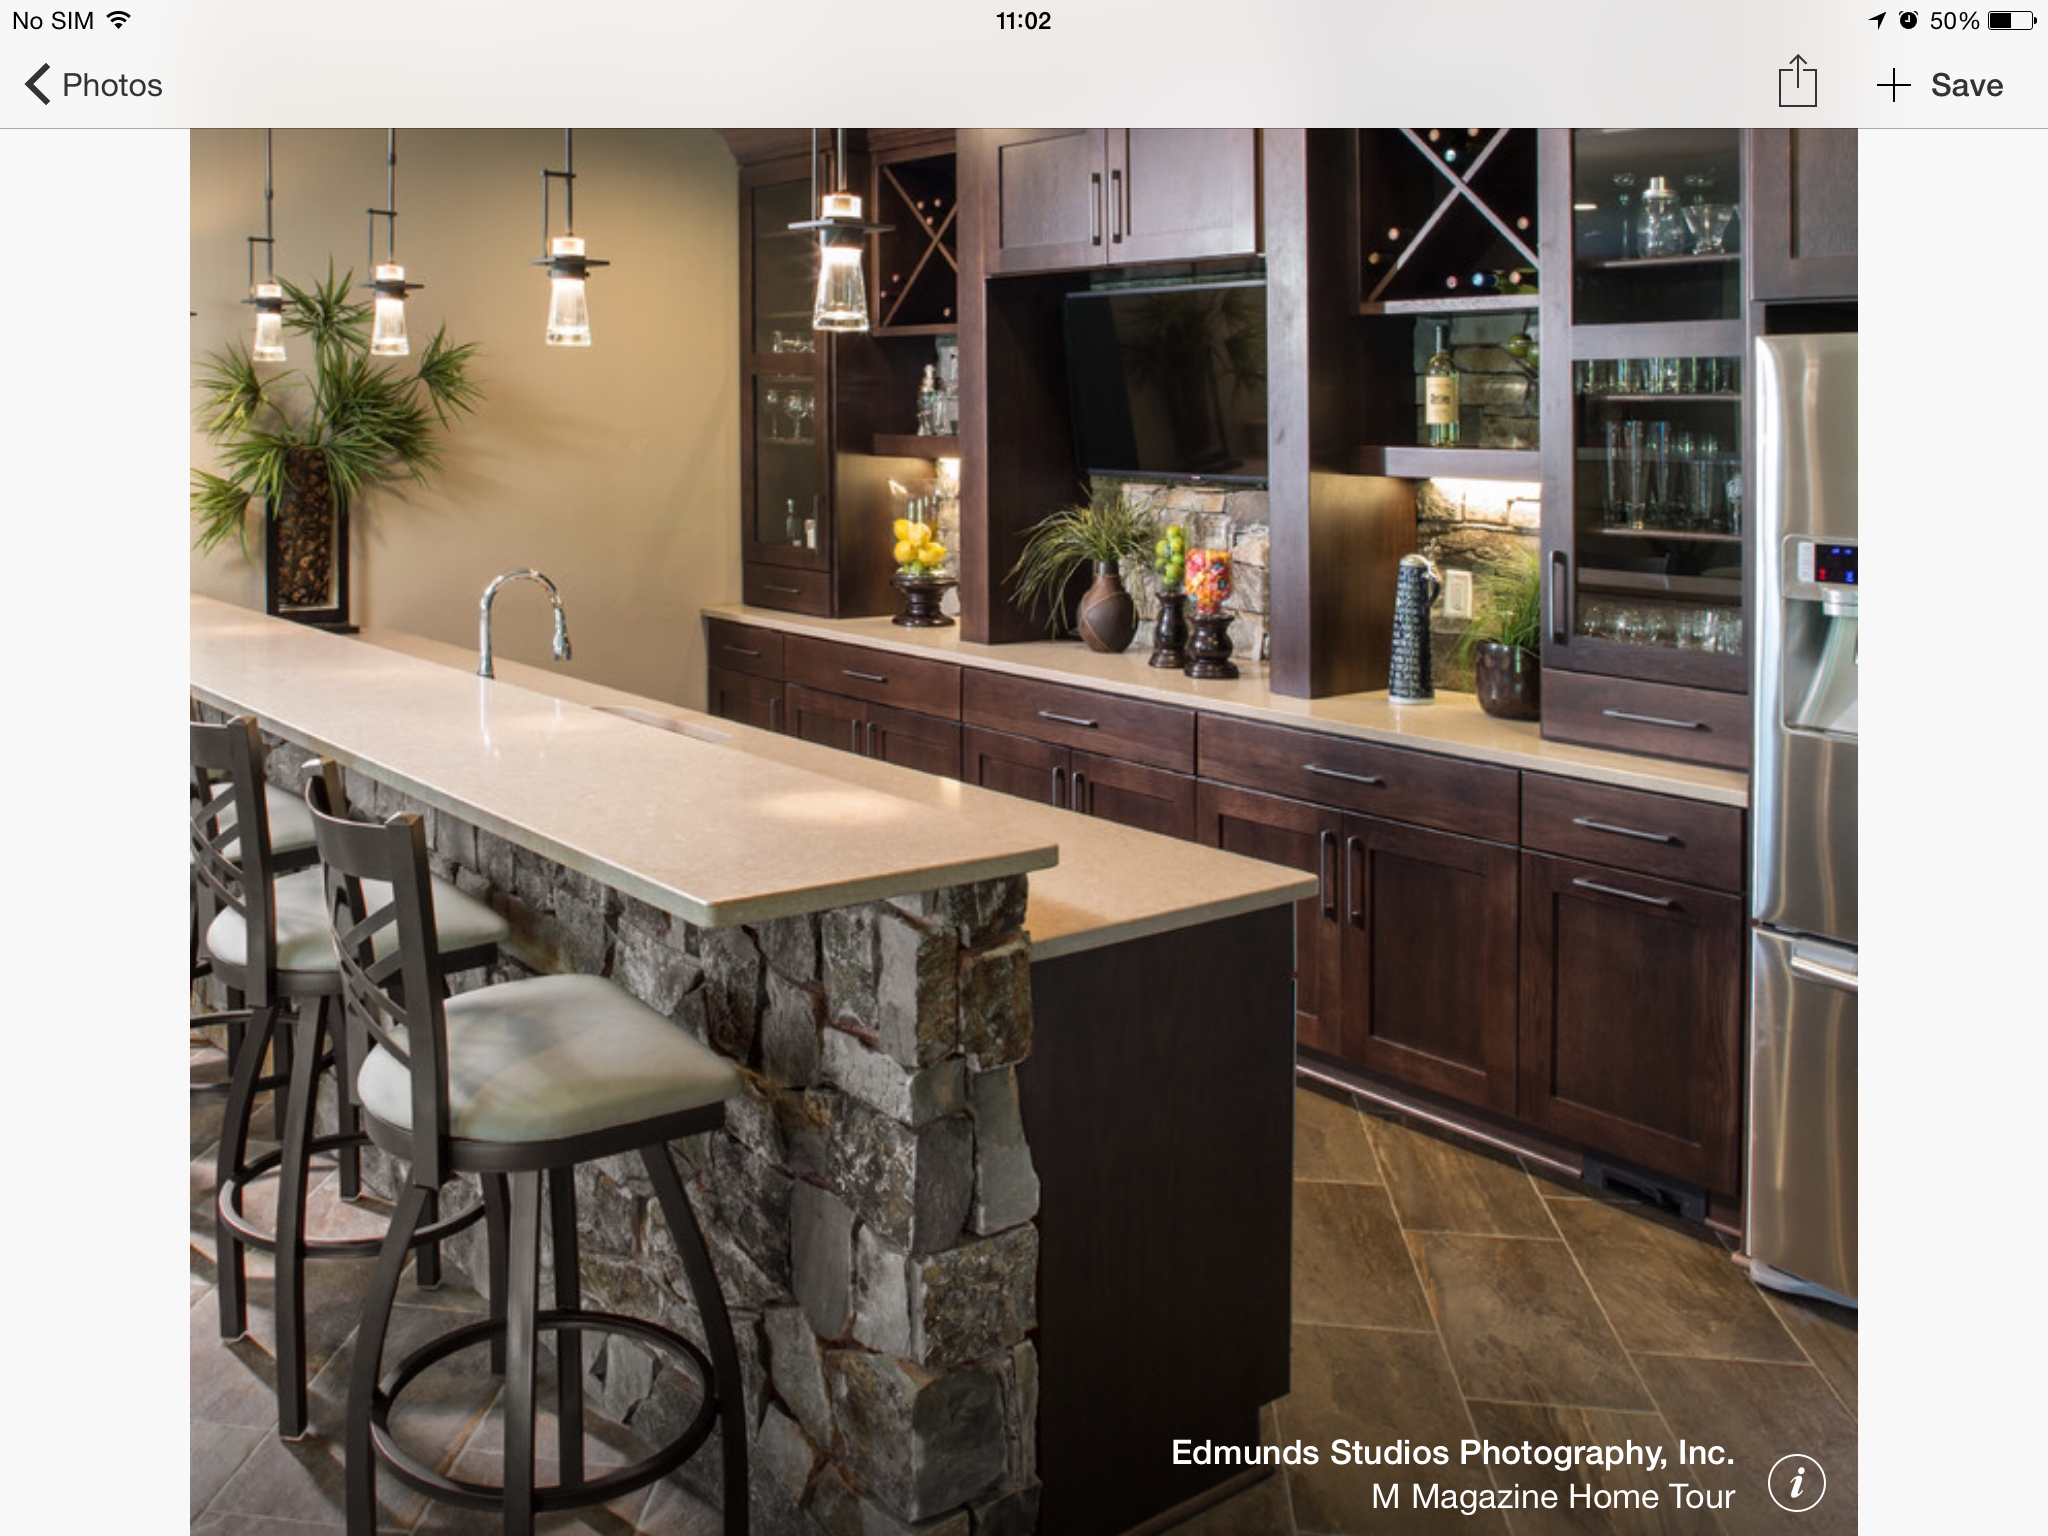 Pin von JoAnn Patrick McCollum auf new house | Pinterest | Umbau